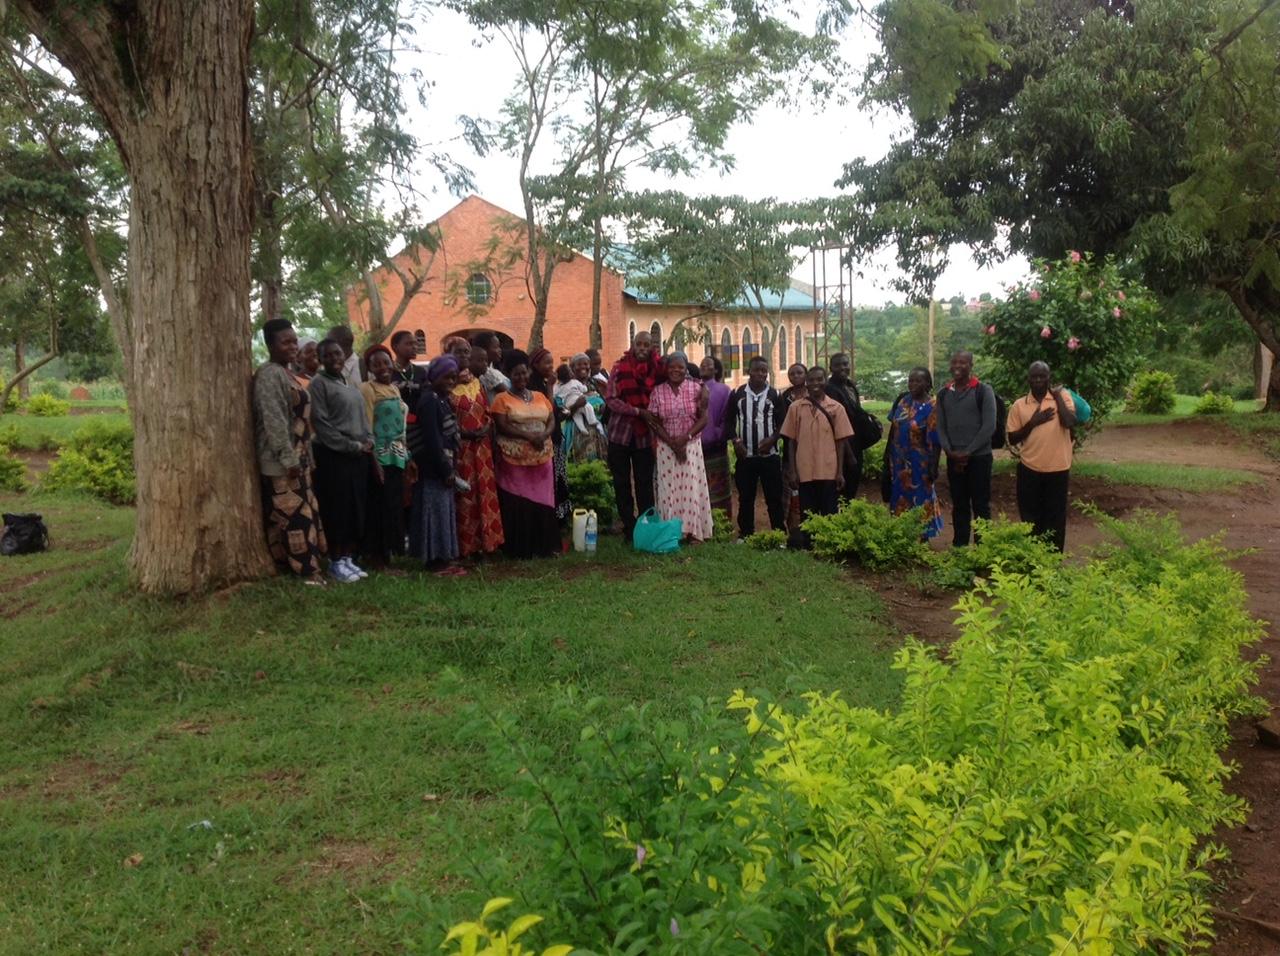 Uganda Martyr Pilgrimage